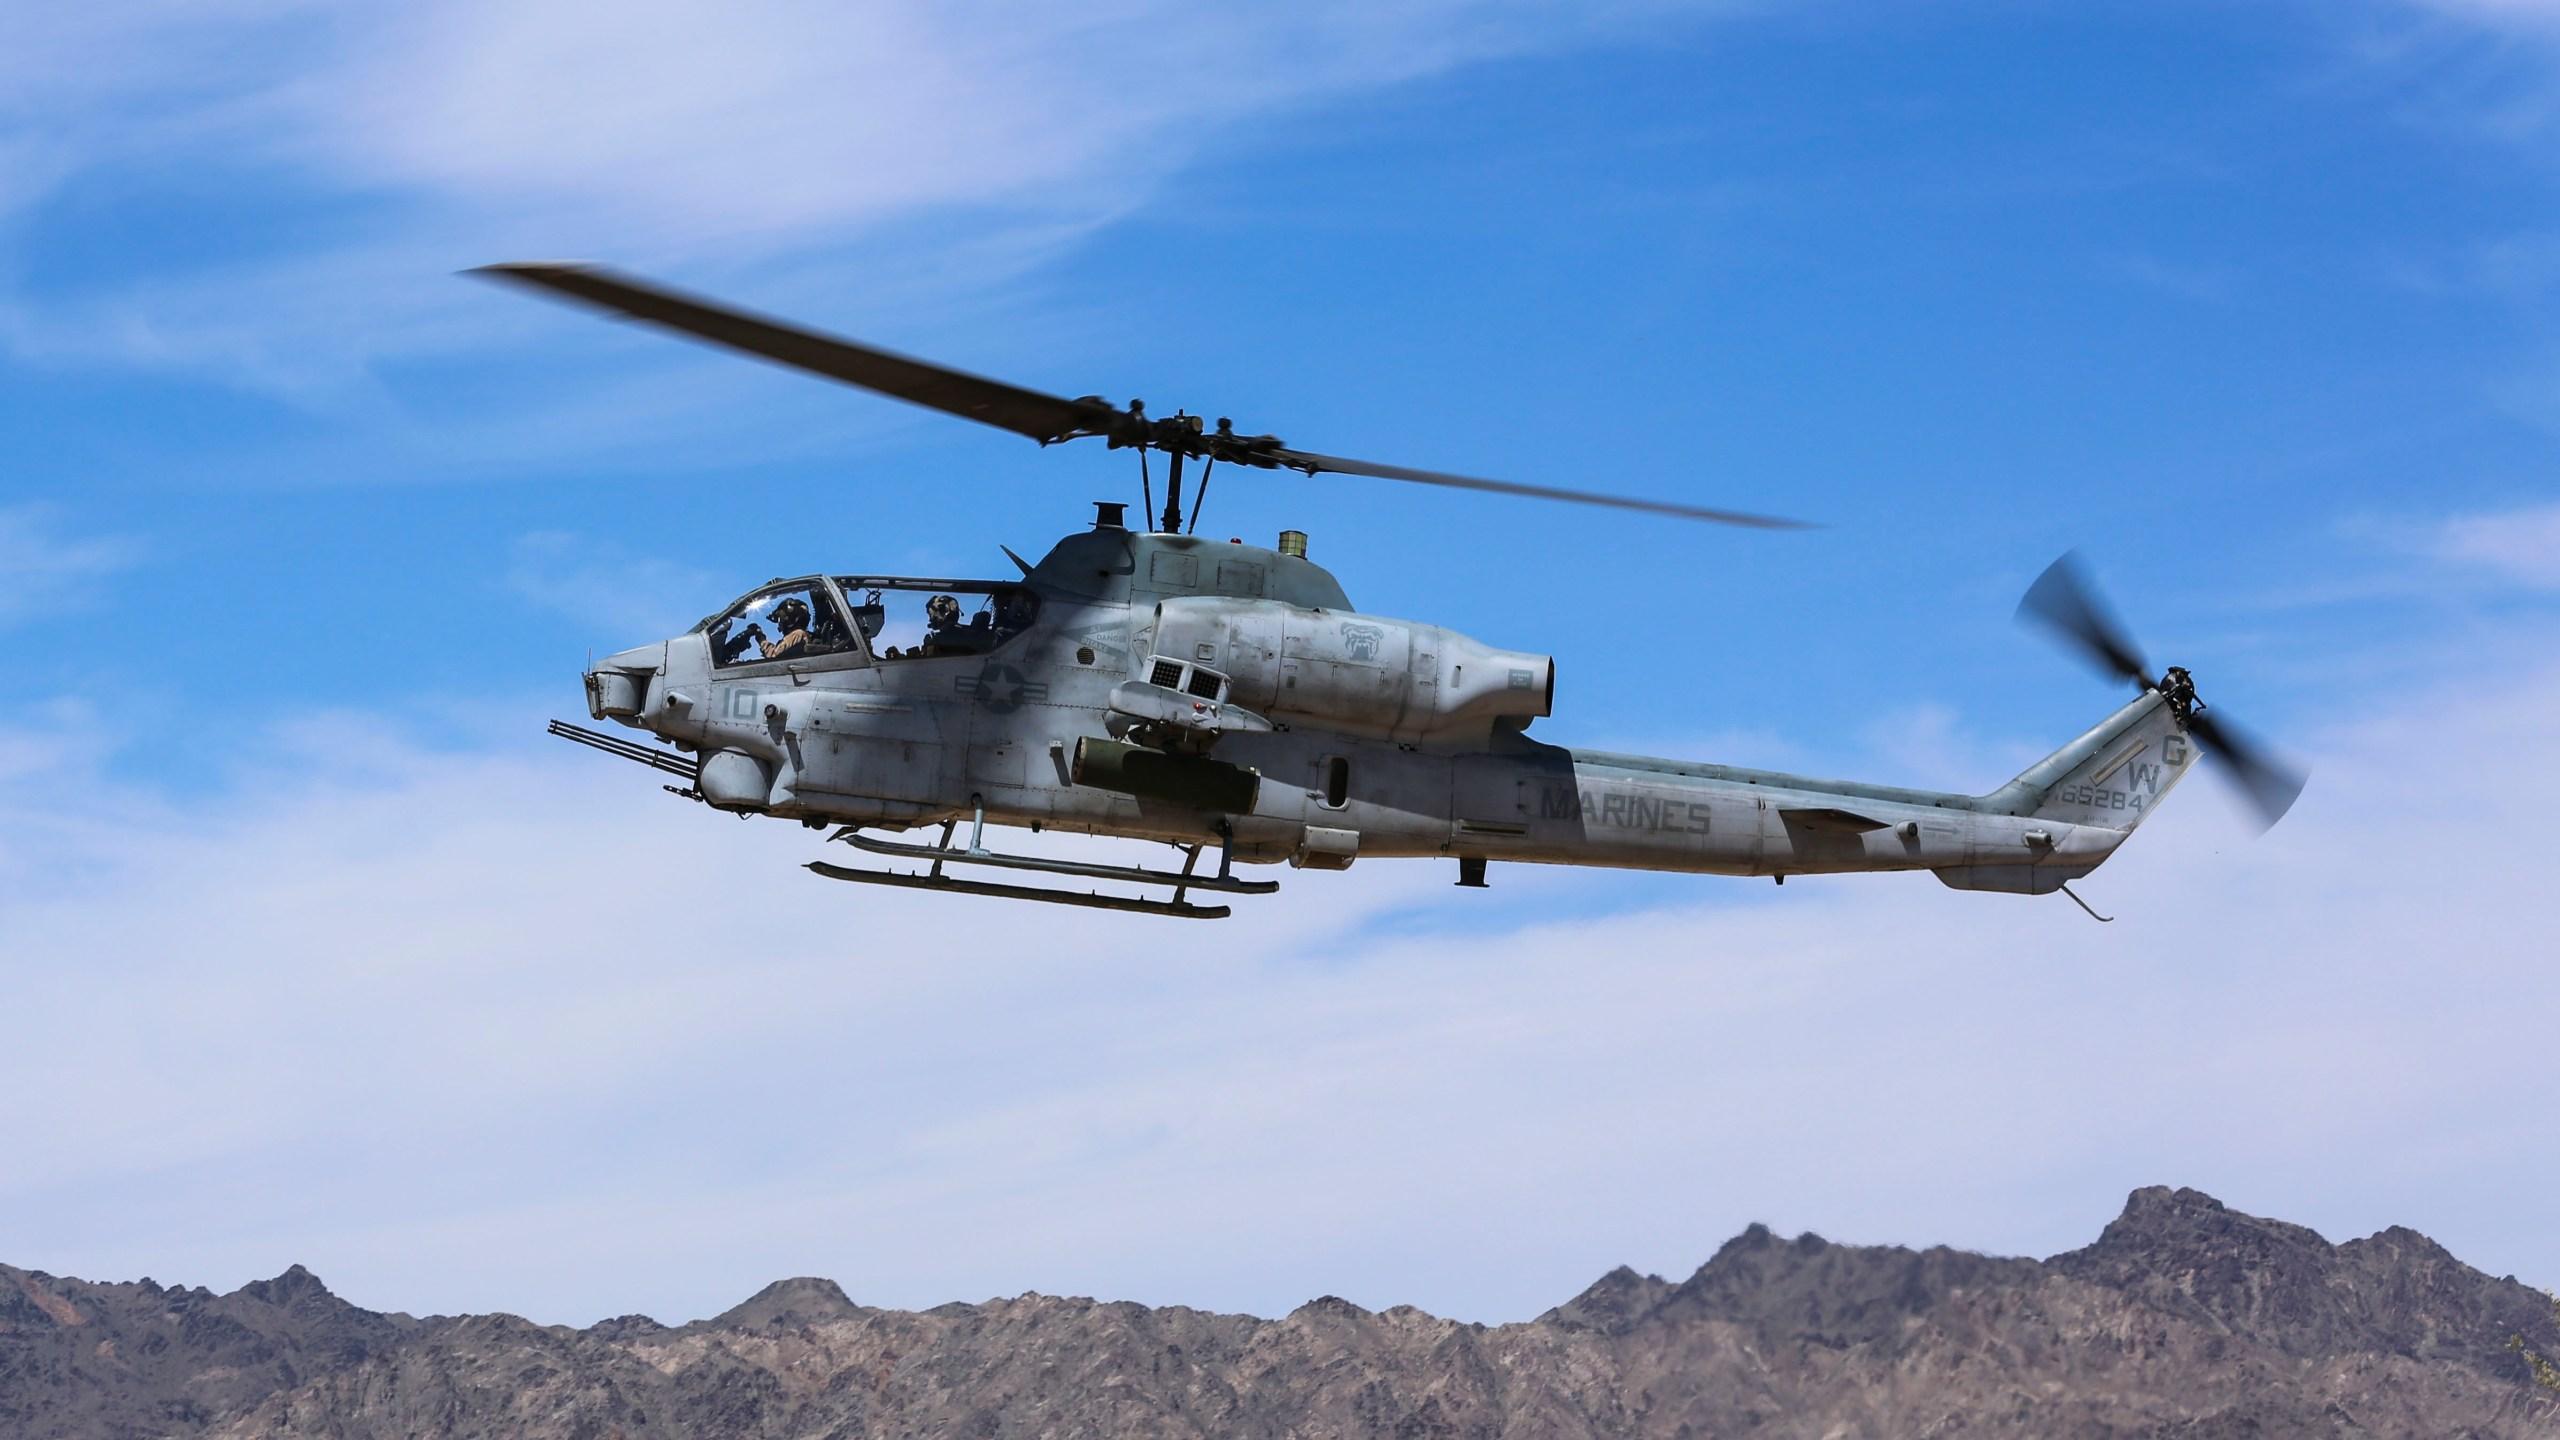 Marine_Helicopter_Crash_66861-159532.jpg79121754